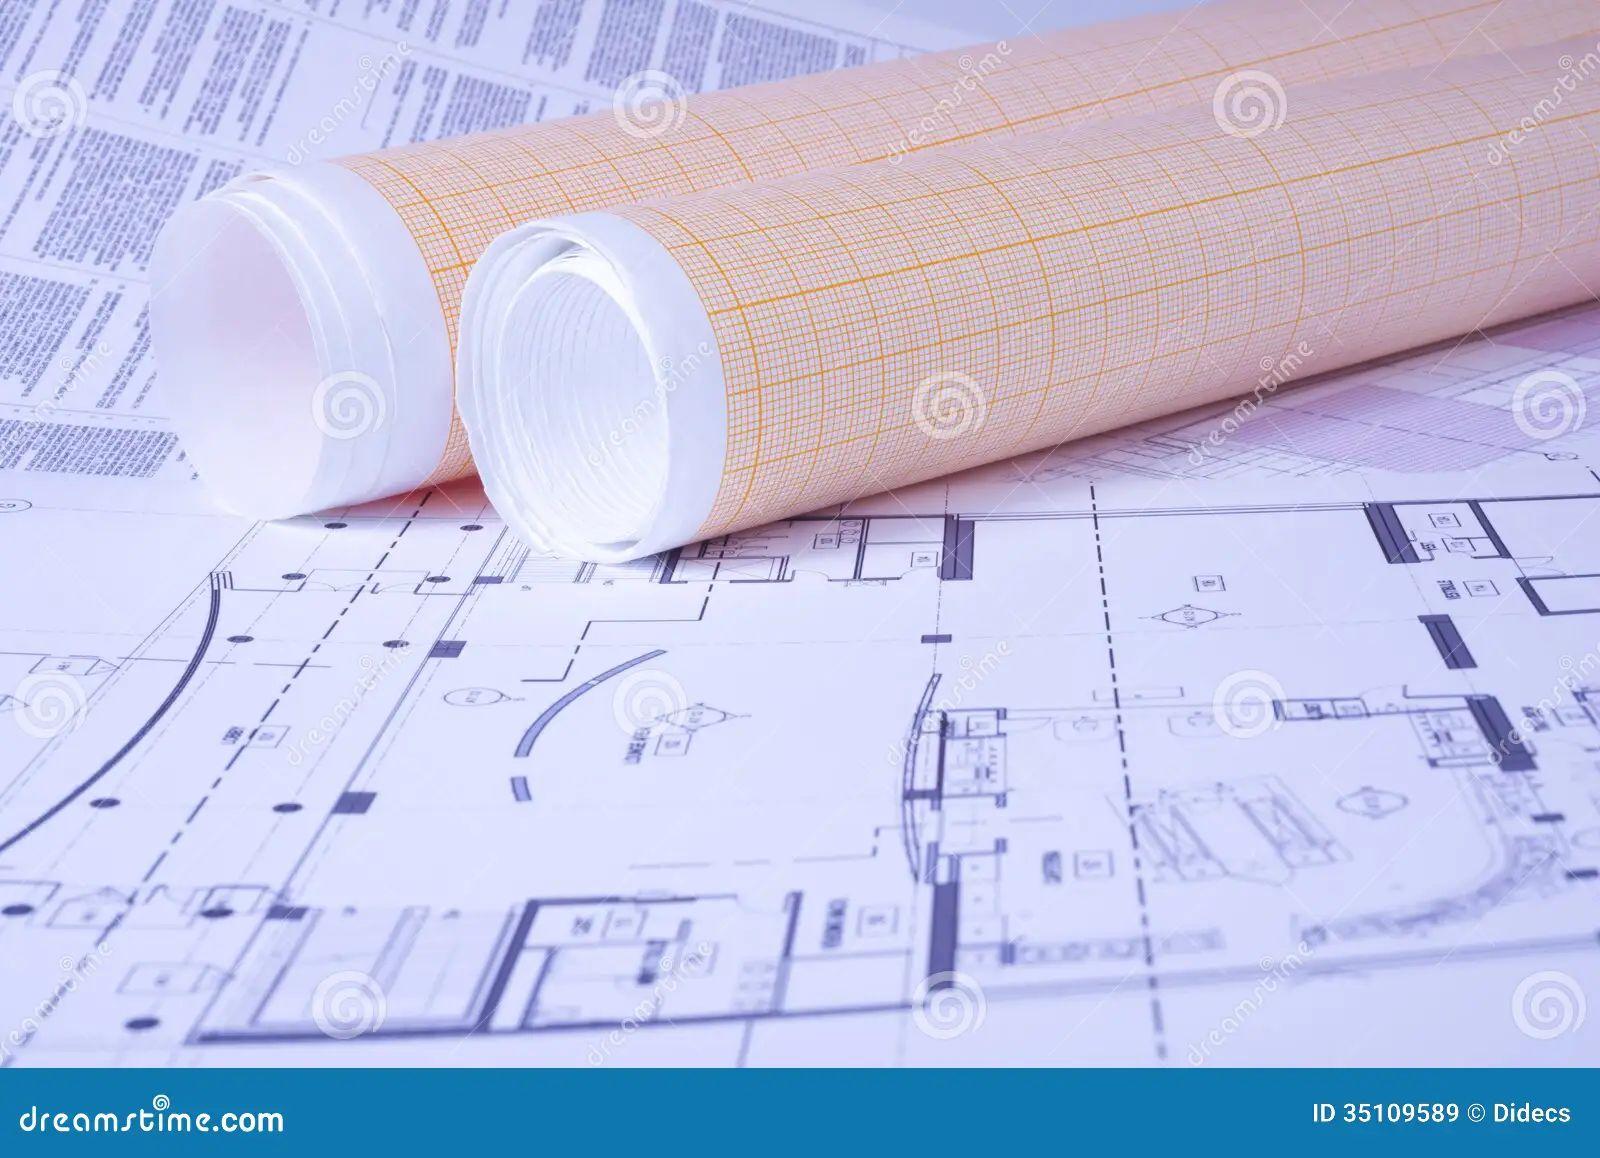 graph paper drawing app